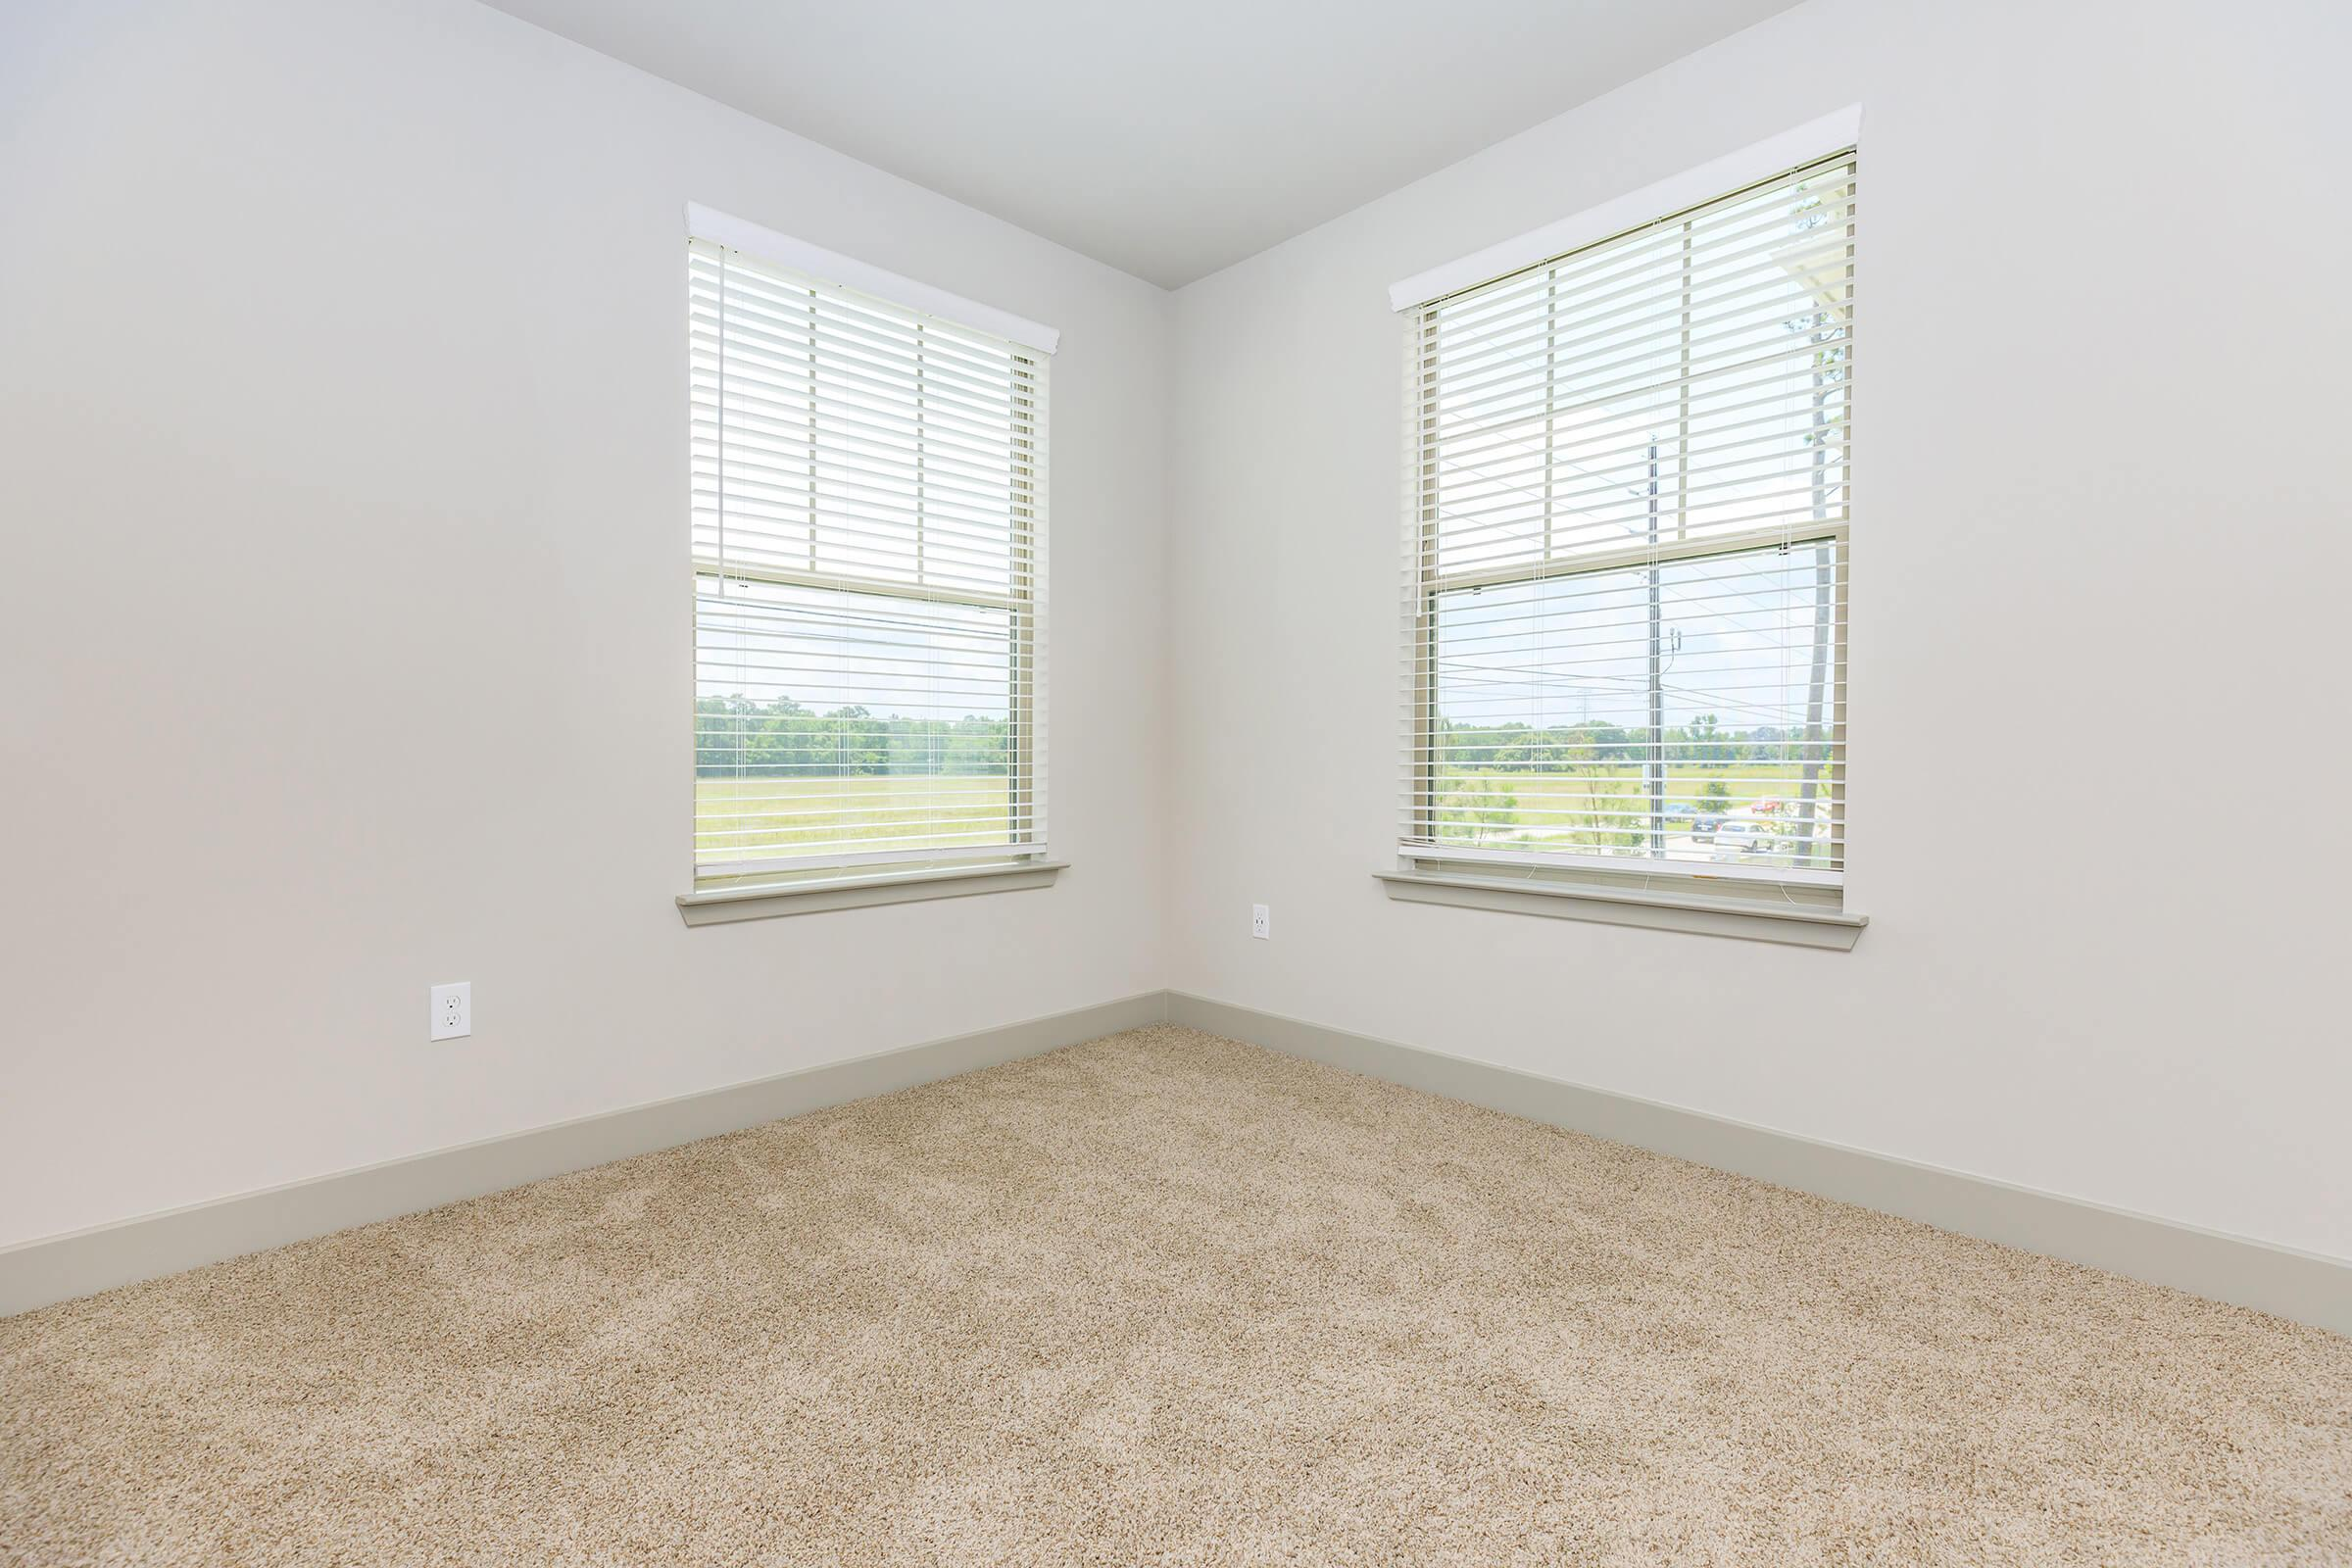 Plush carpeting in the bedrooms at Ariza Gosling in Spring, TX